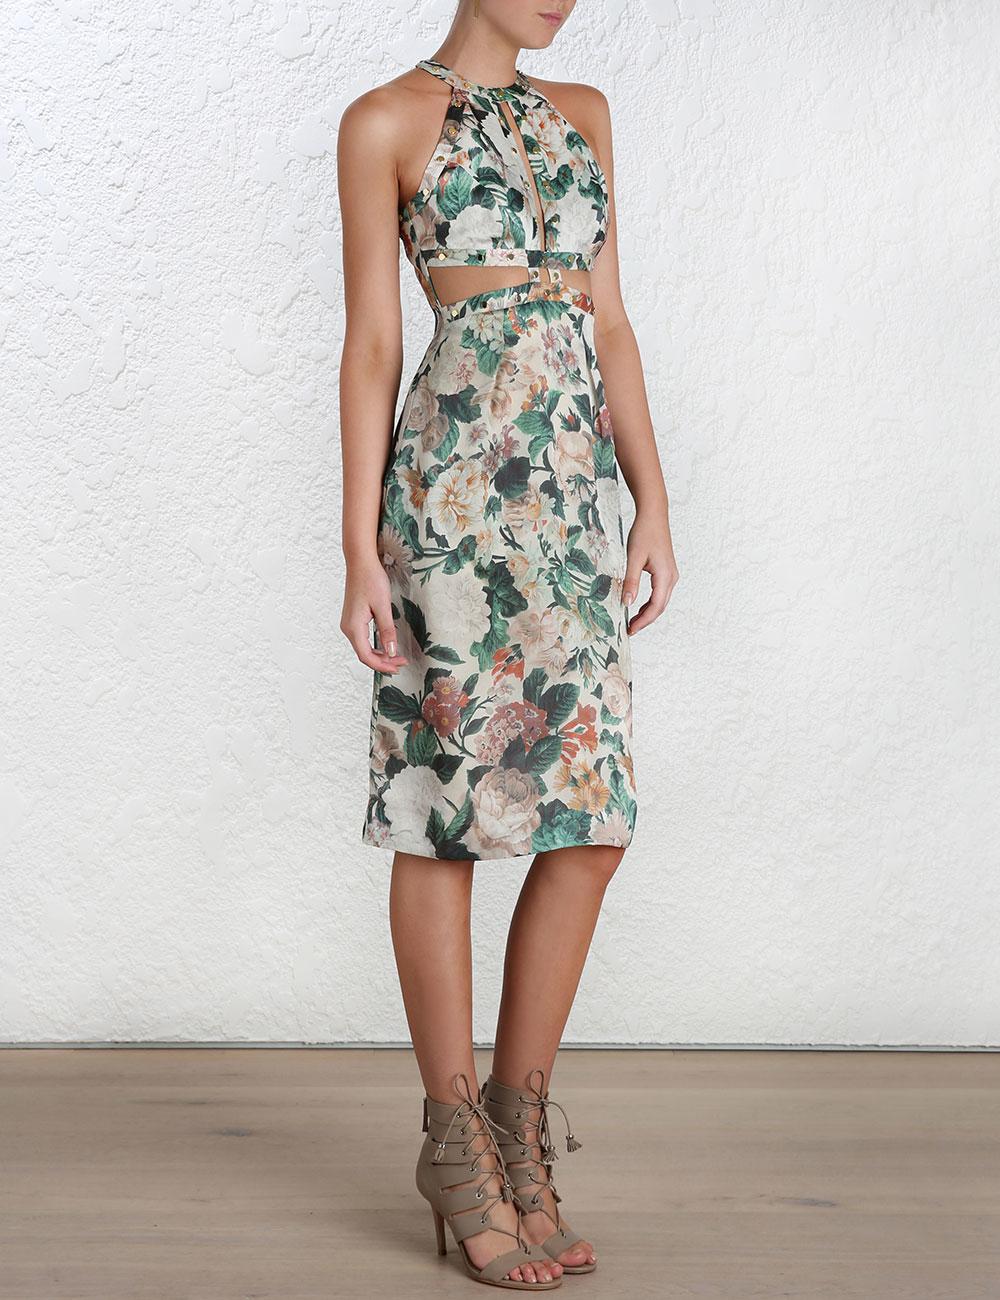 Zimmermann Floral Dress 2015